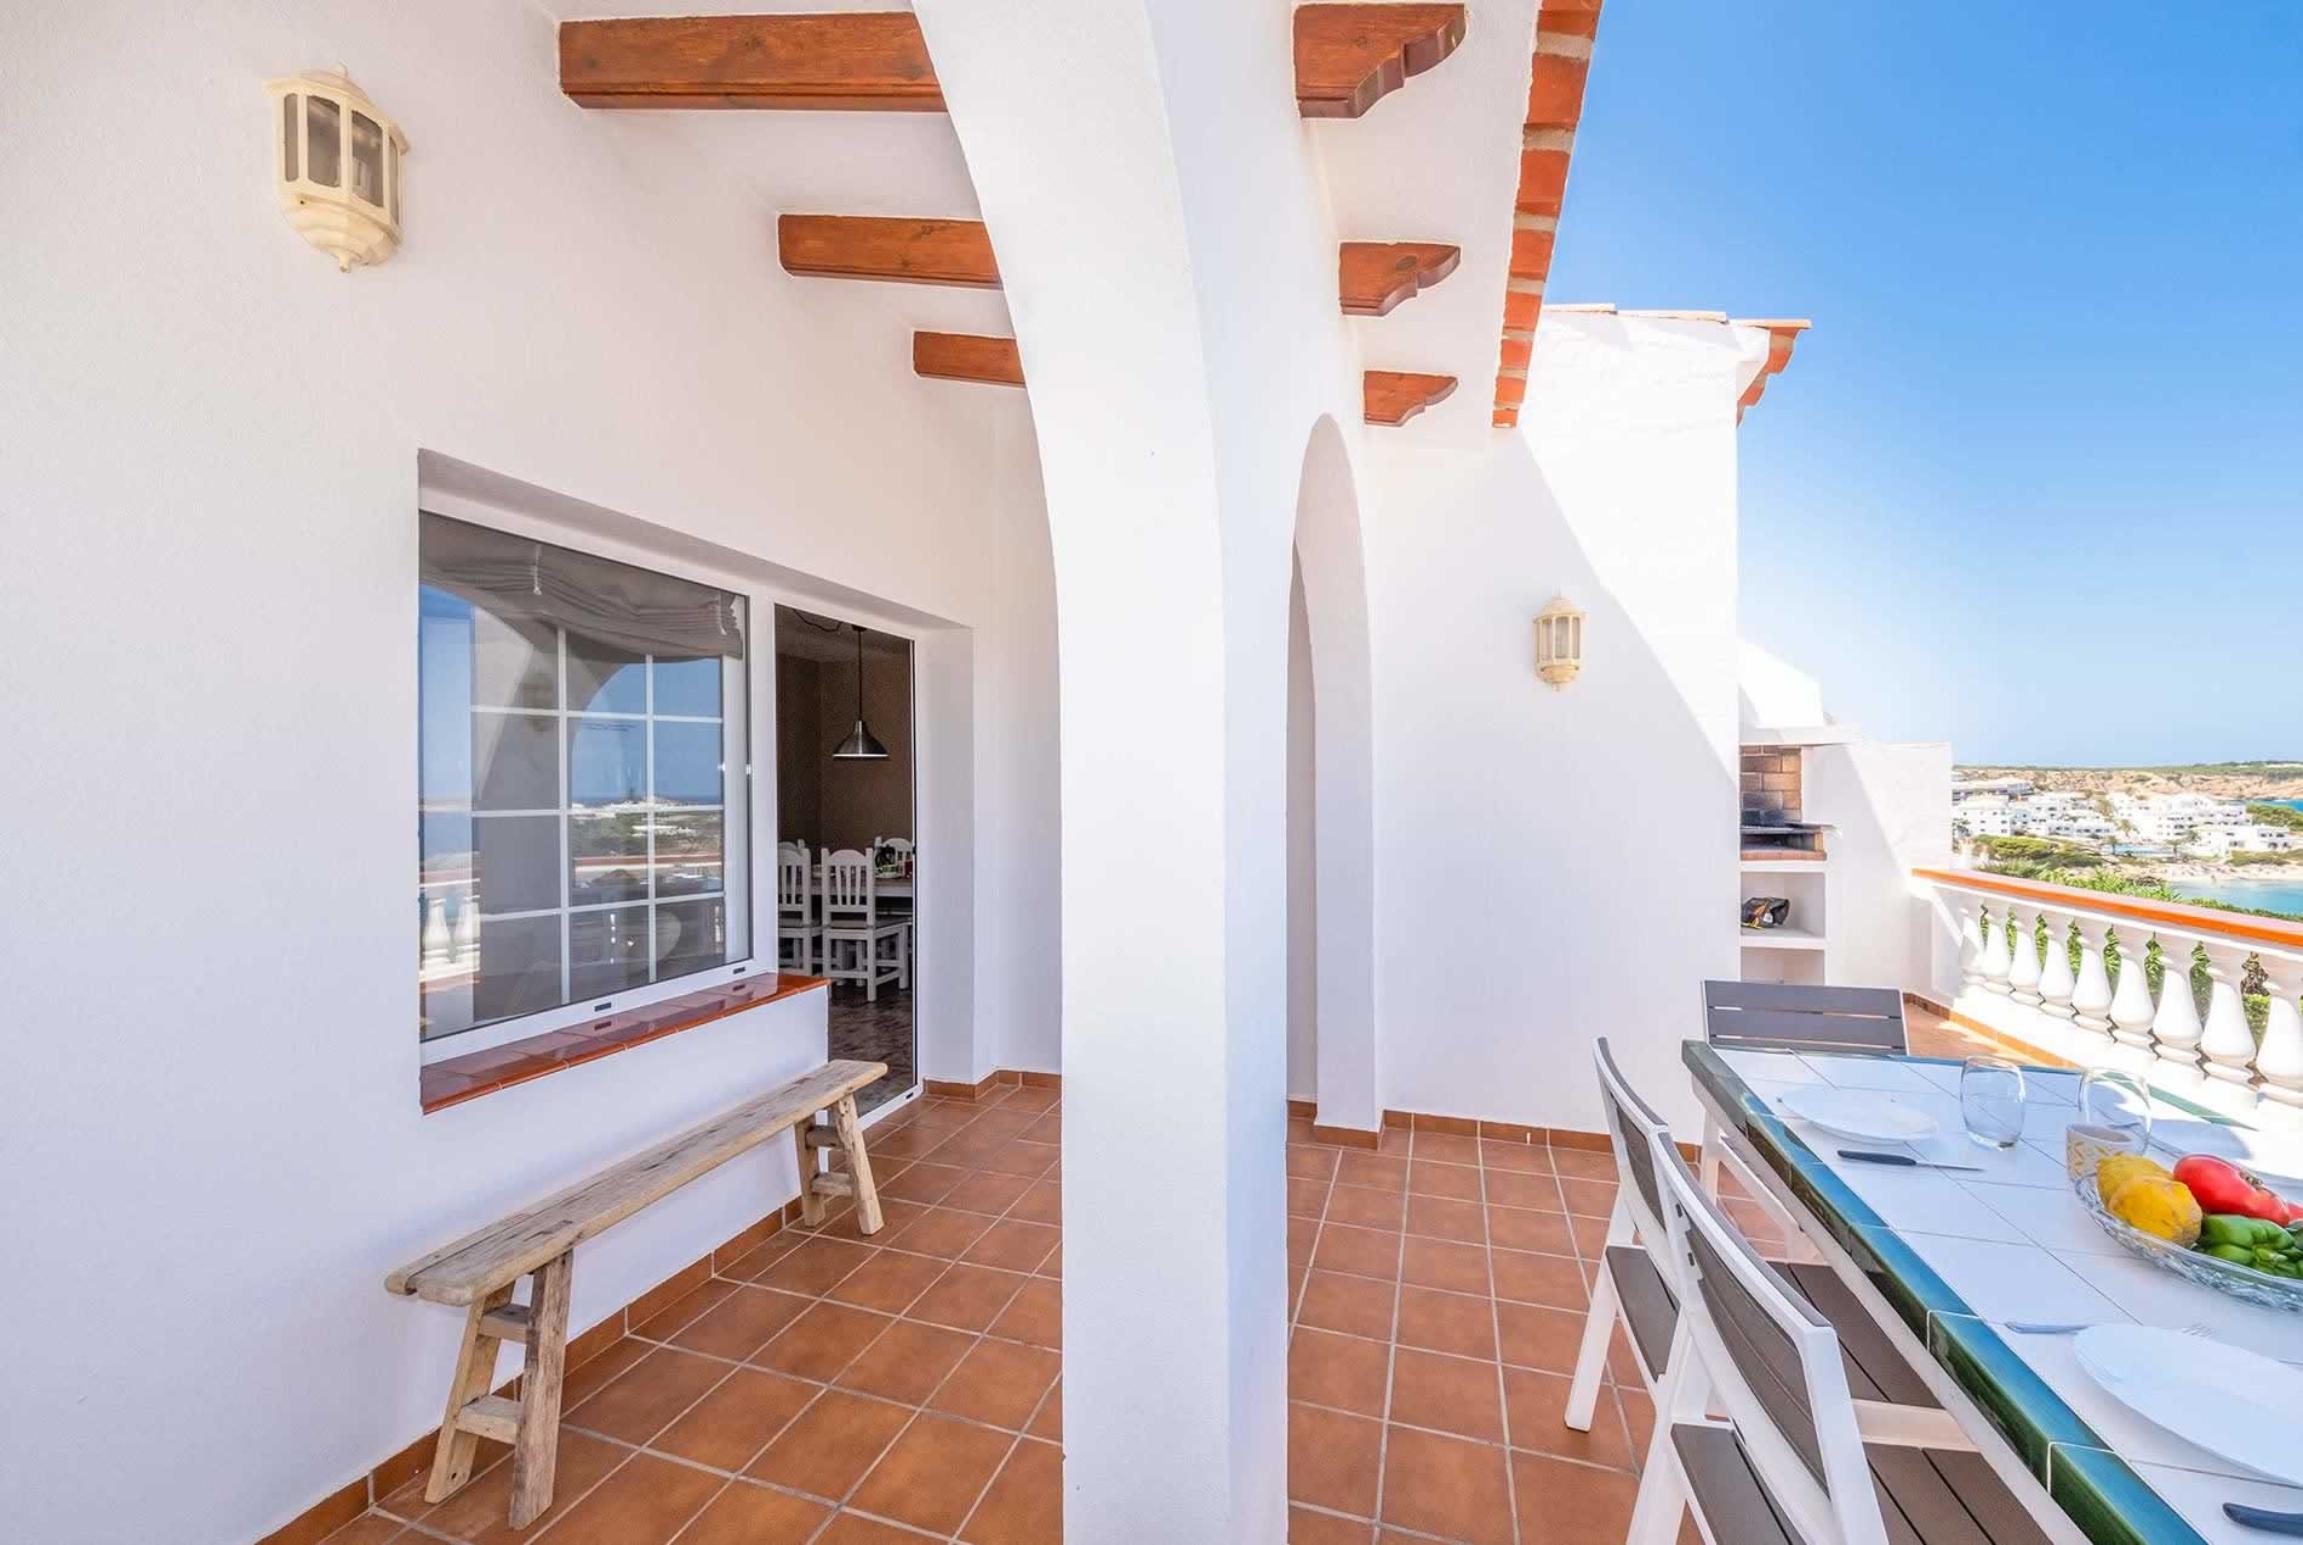 Ferienhaus Bellavista II (2654270), Arenal De'N Castell, Menorca, Balearische Inseln, Spanien, Bild 37